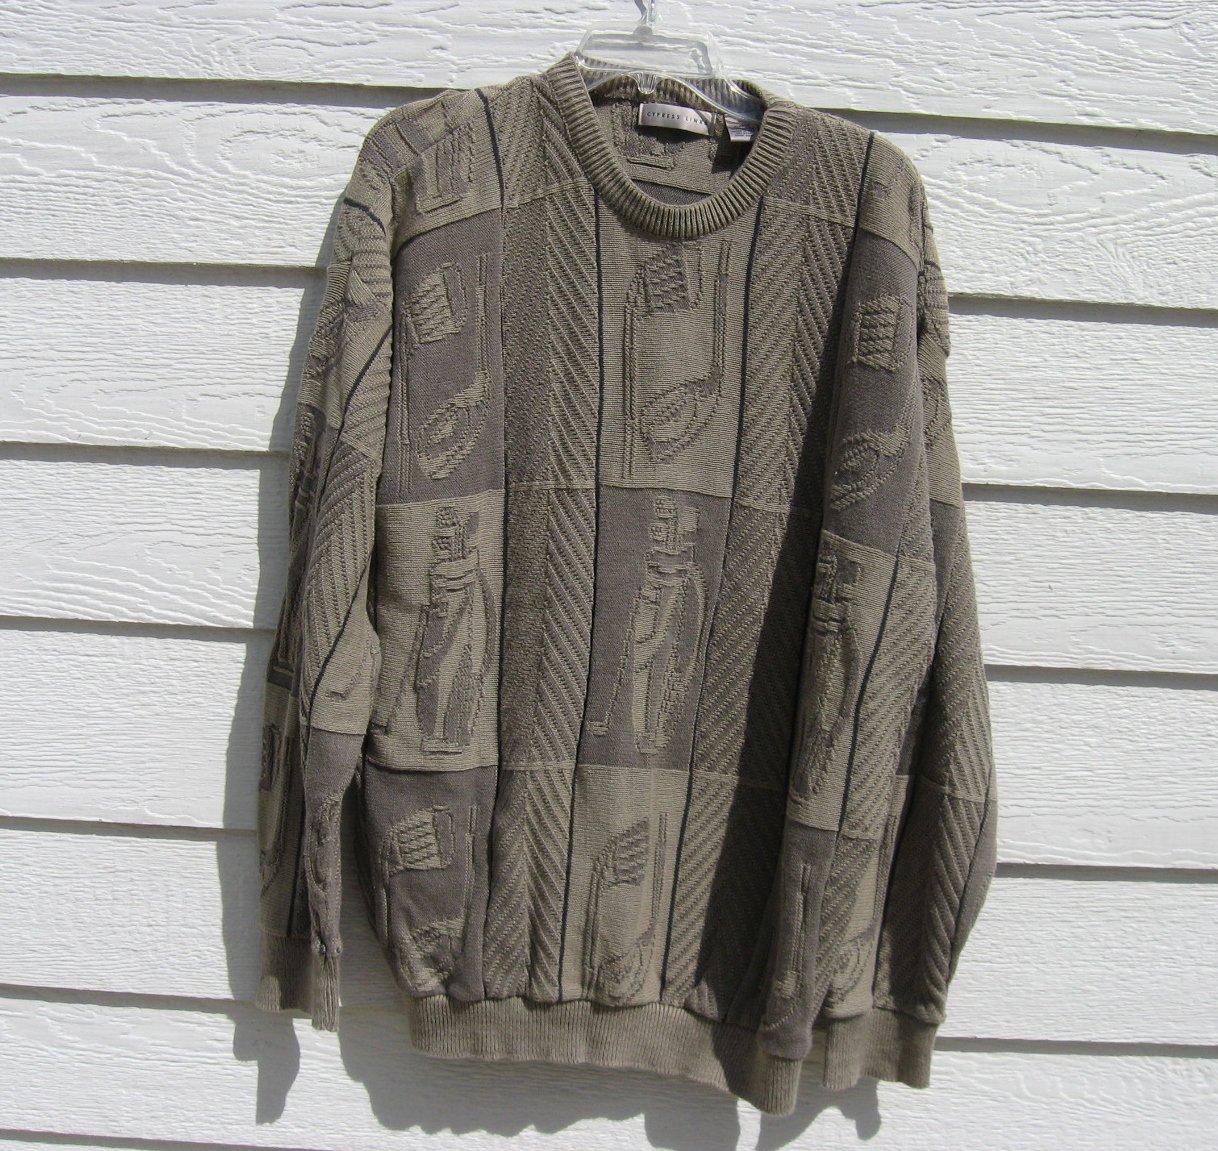 Cypress Link Golf Sweater XL 52 Chest Army Green Golf Clubs Texture